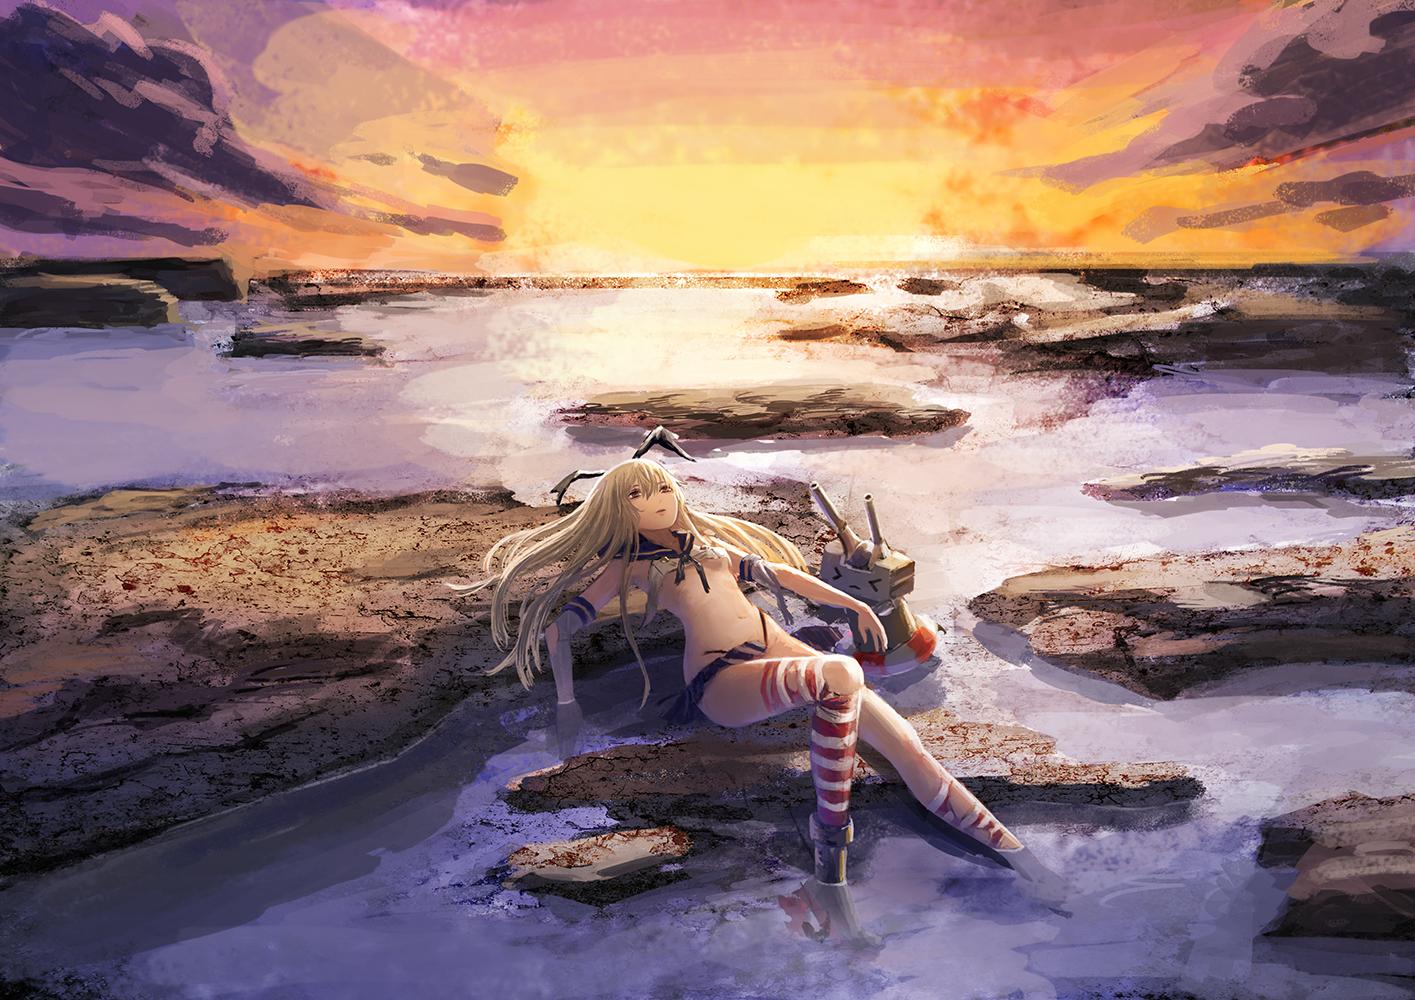 anthropomorphism blonde_hair clouds kantai_collection long_hair menka navel shimakaze_(kancolle) skirt sky sunset thighhighs water